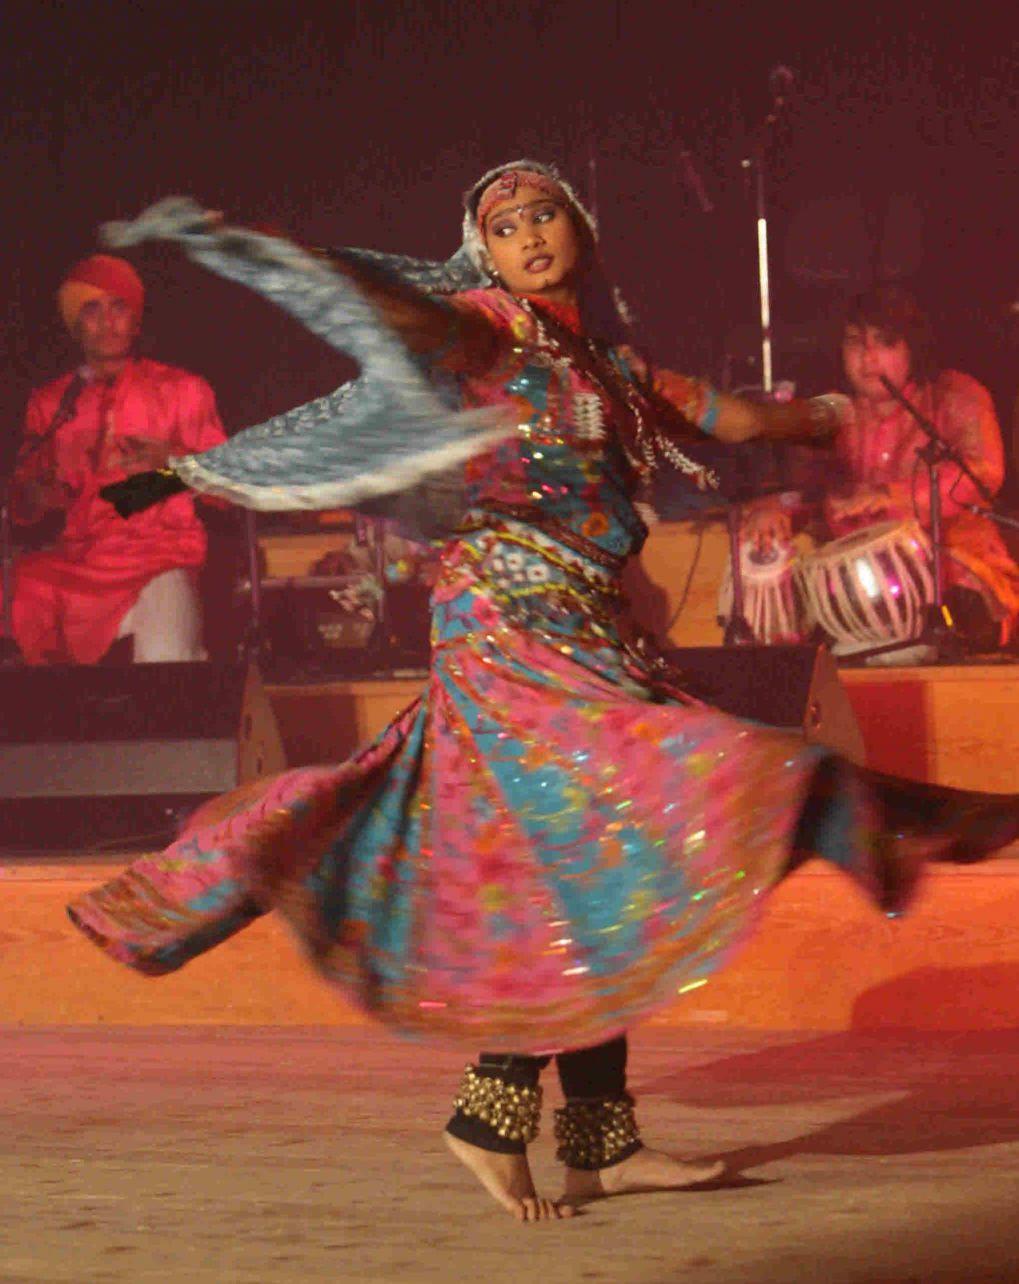 Dhoad Gypsyfestival 2009 Ratna